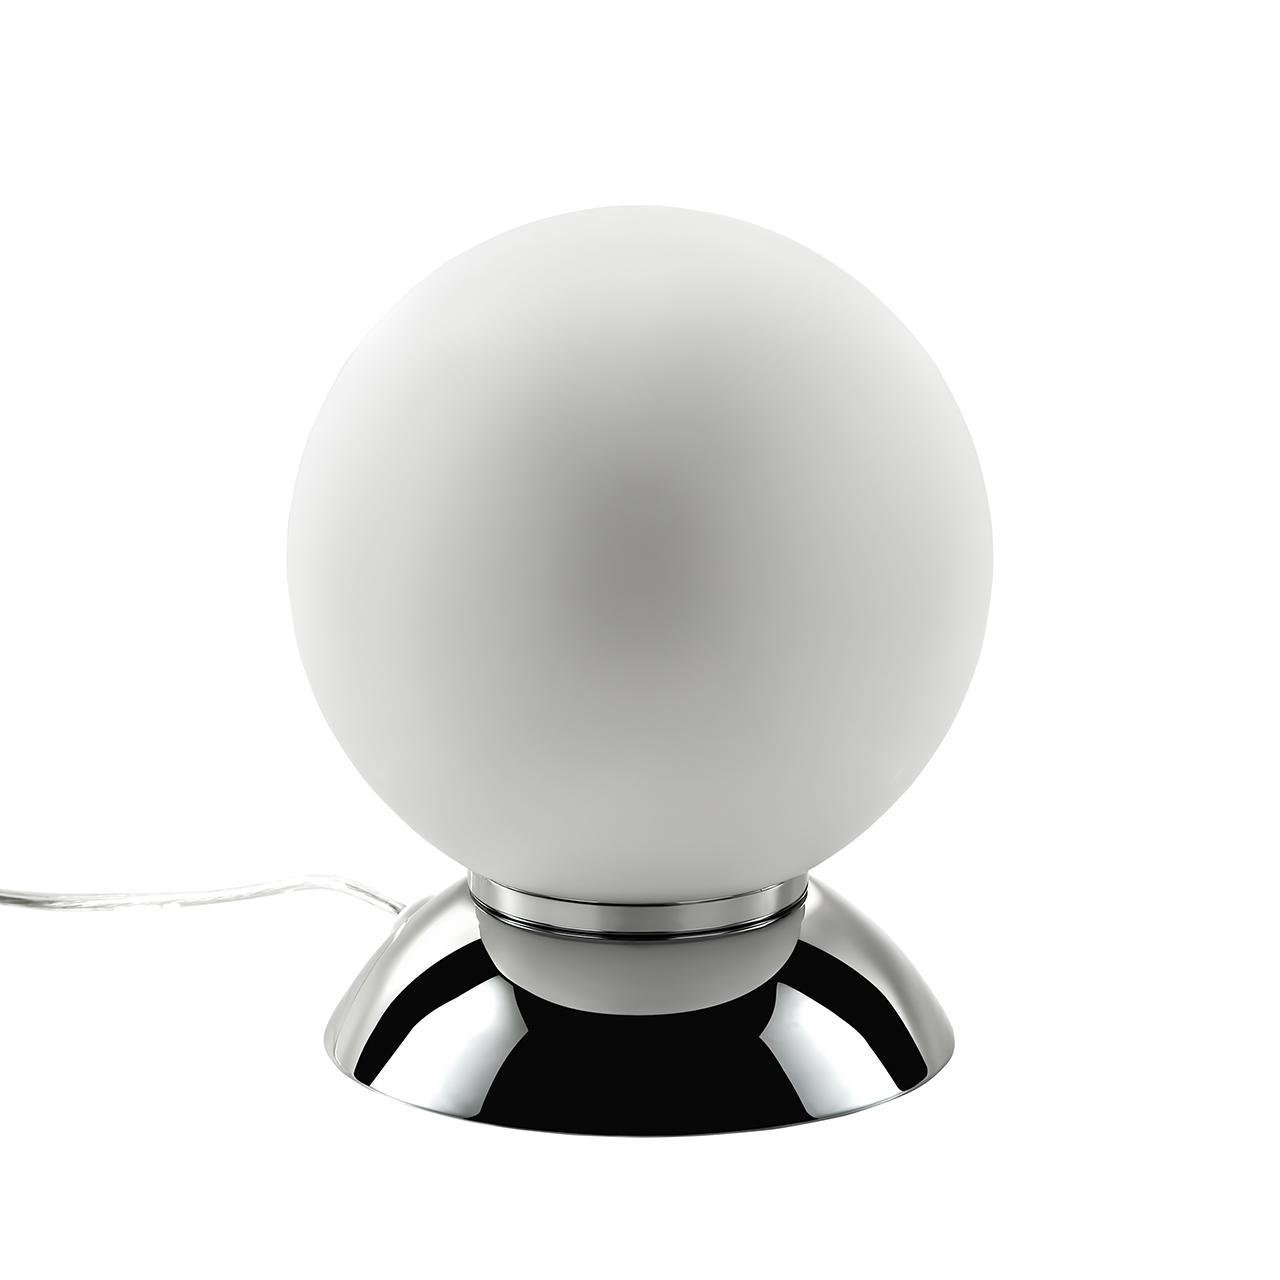 Настольная лампа Lightstar Globo 813914 lightstar 813914 mt5092 1cr настольная лампа globo 1х40w e14 chrome white шт